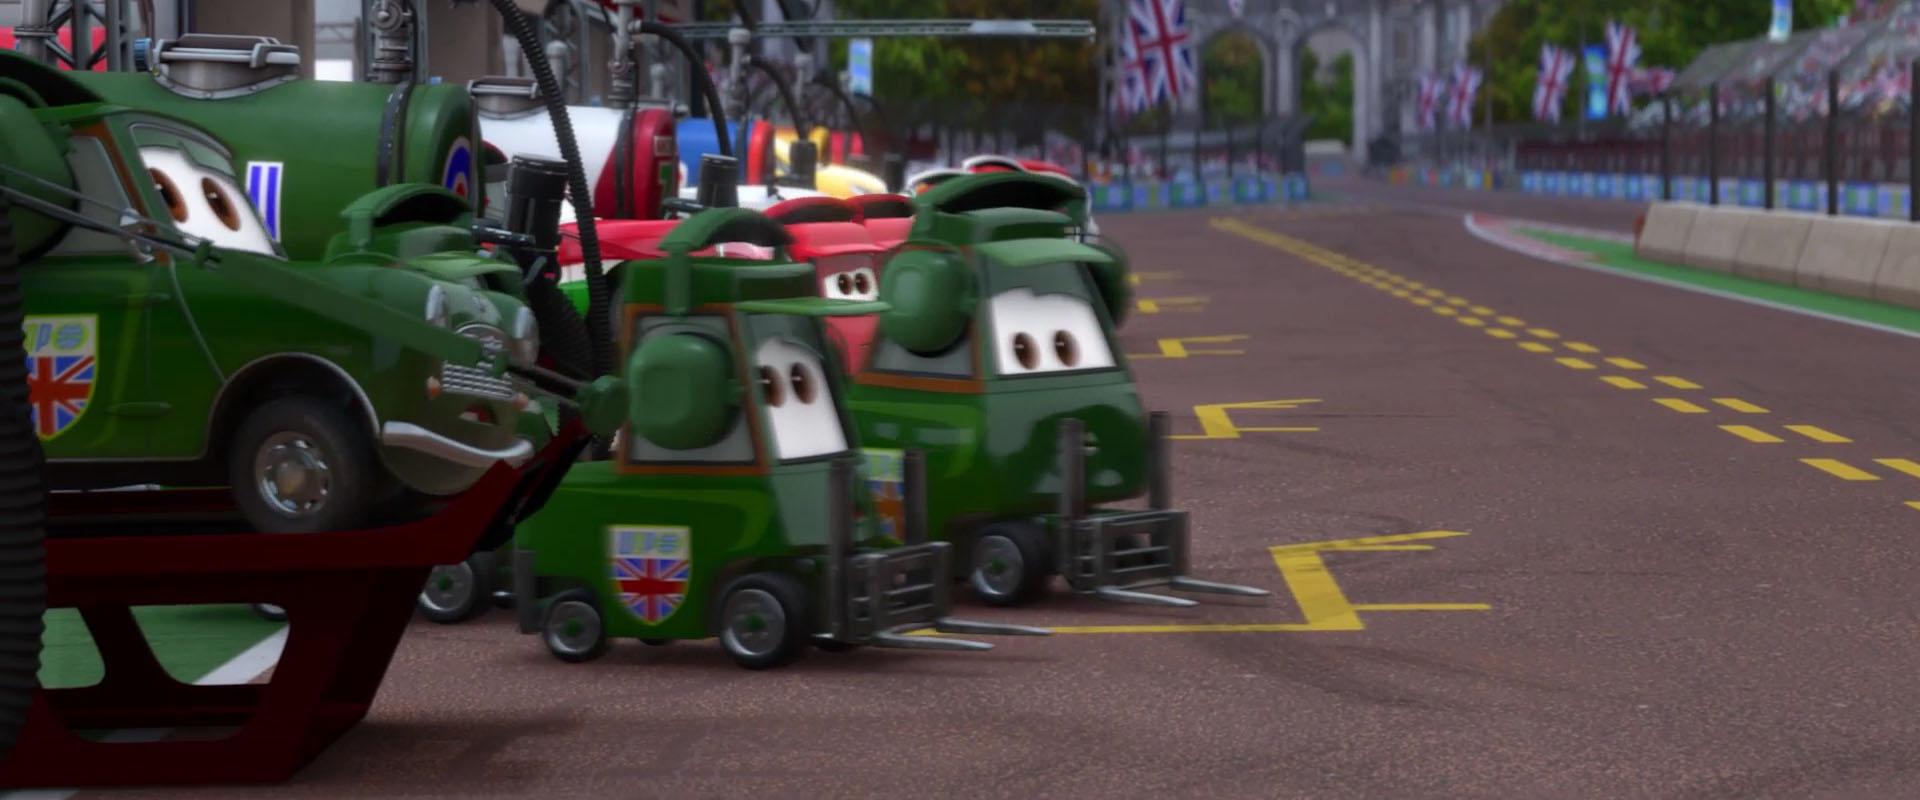 austin-littleton-personnage-cars-2-01